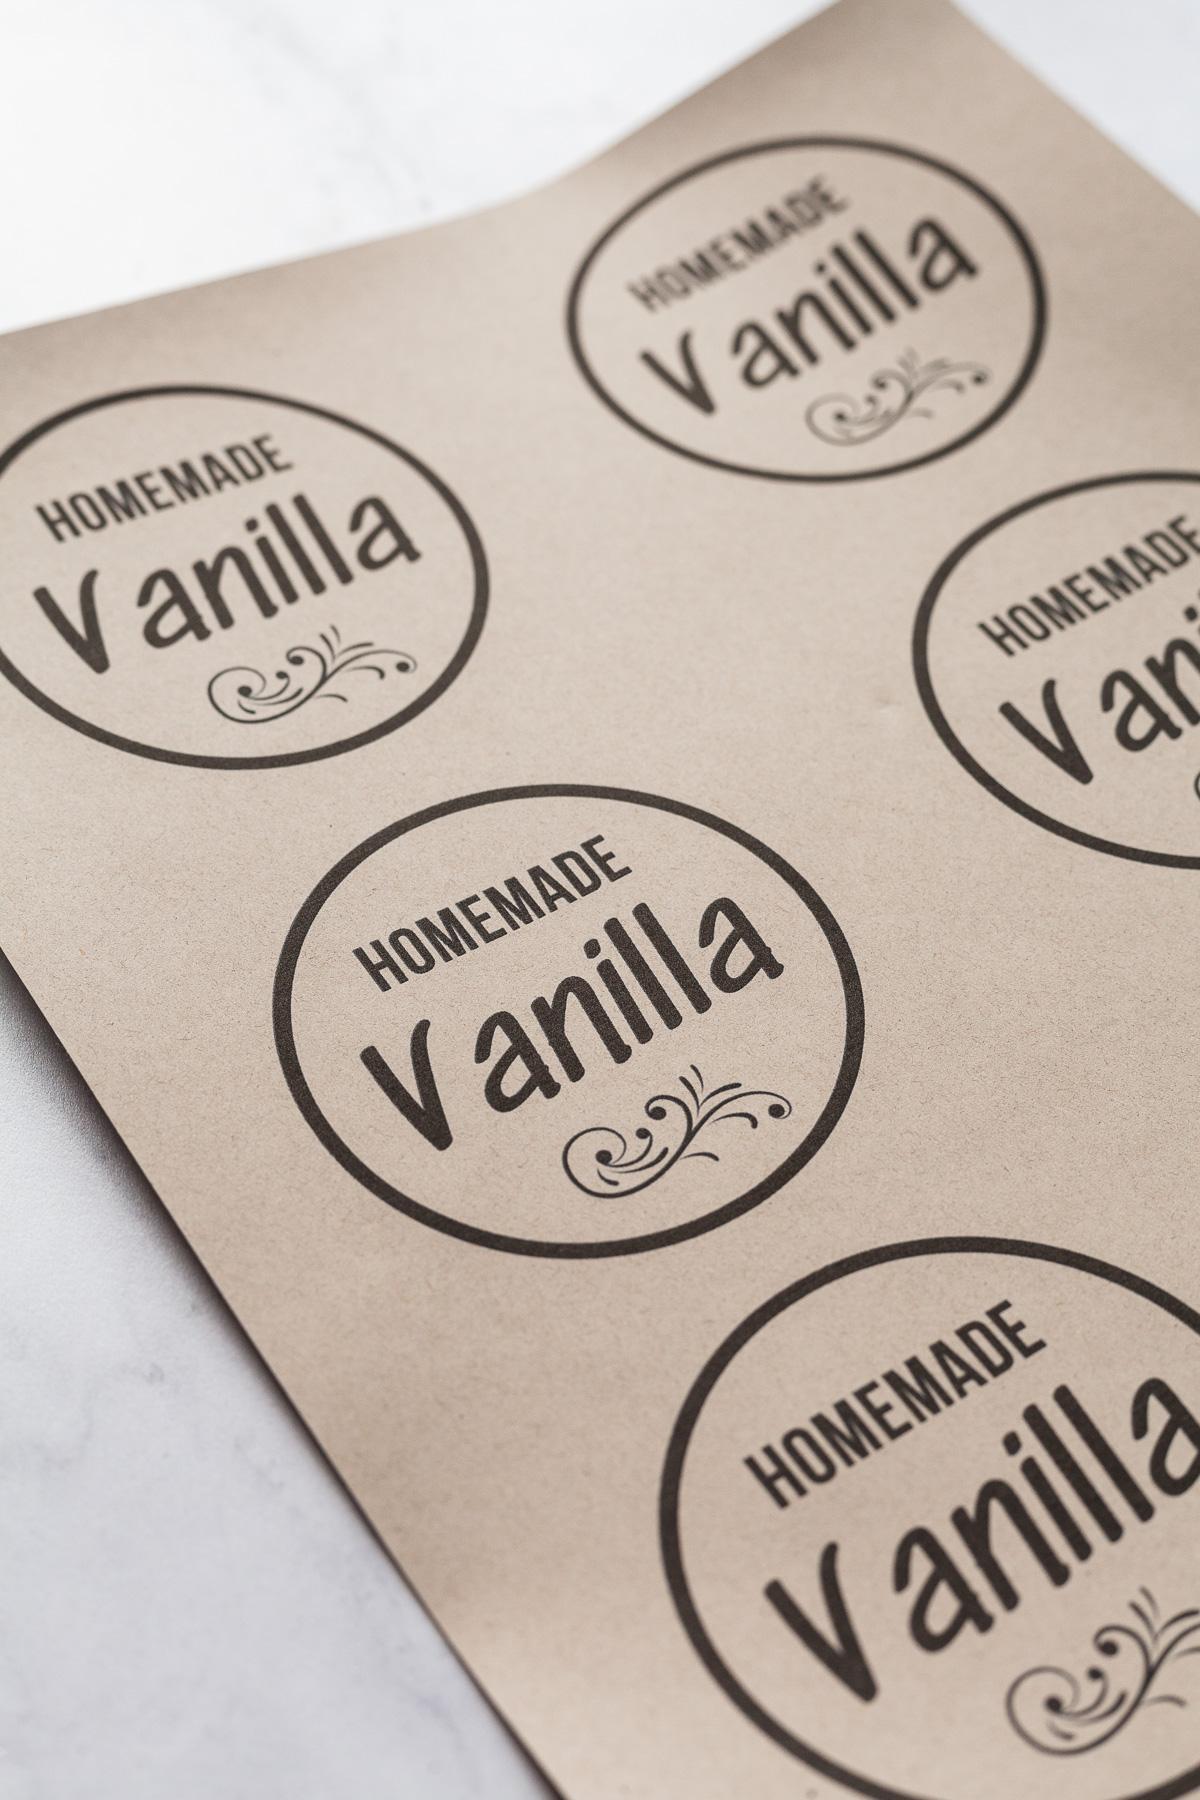 image of homemade vanilla labels